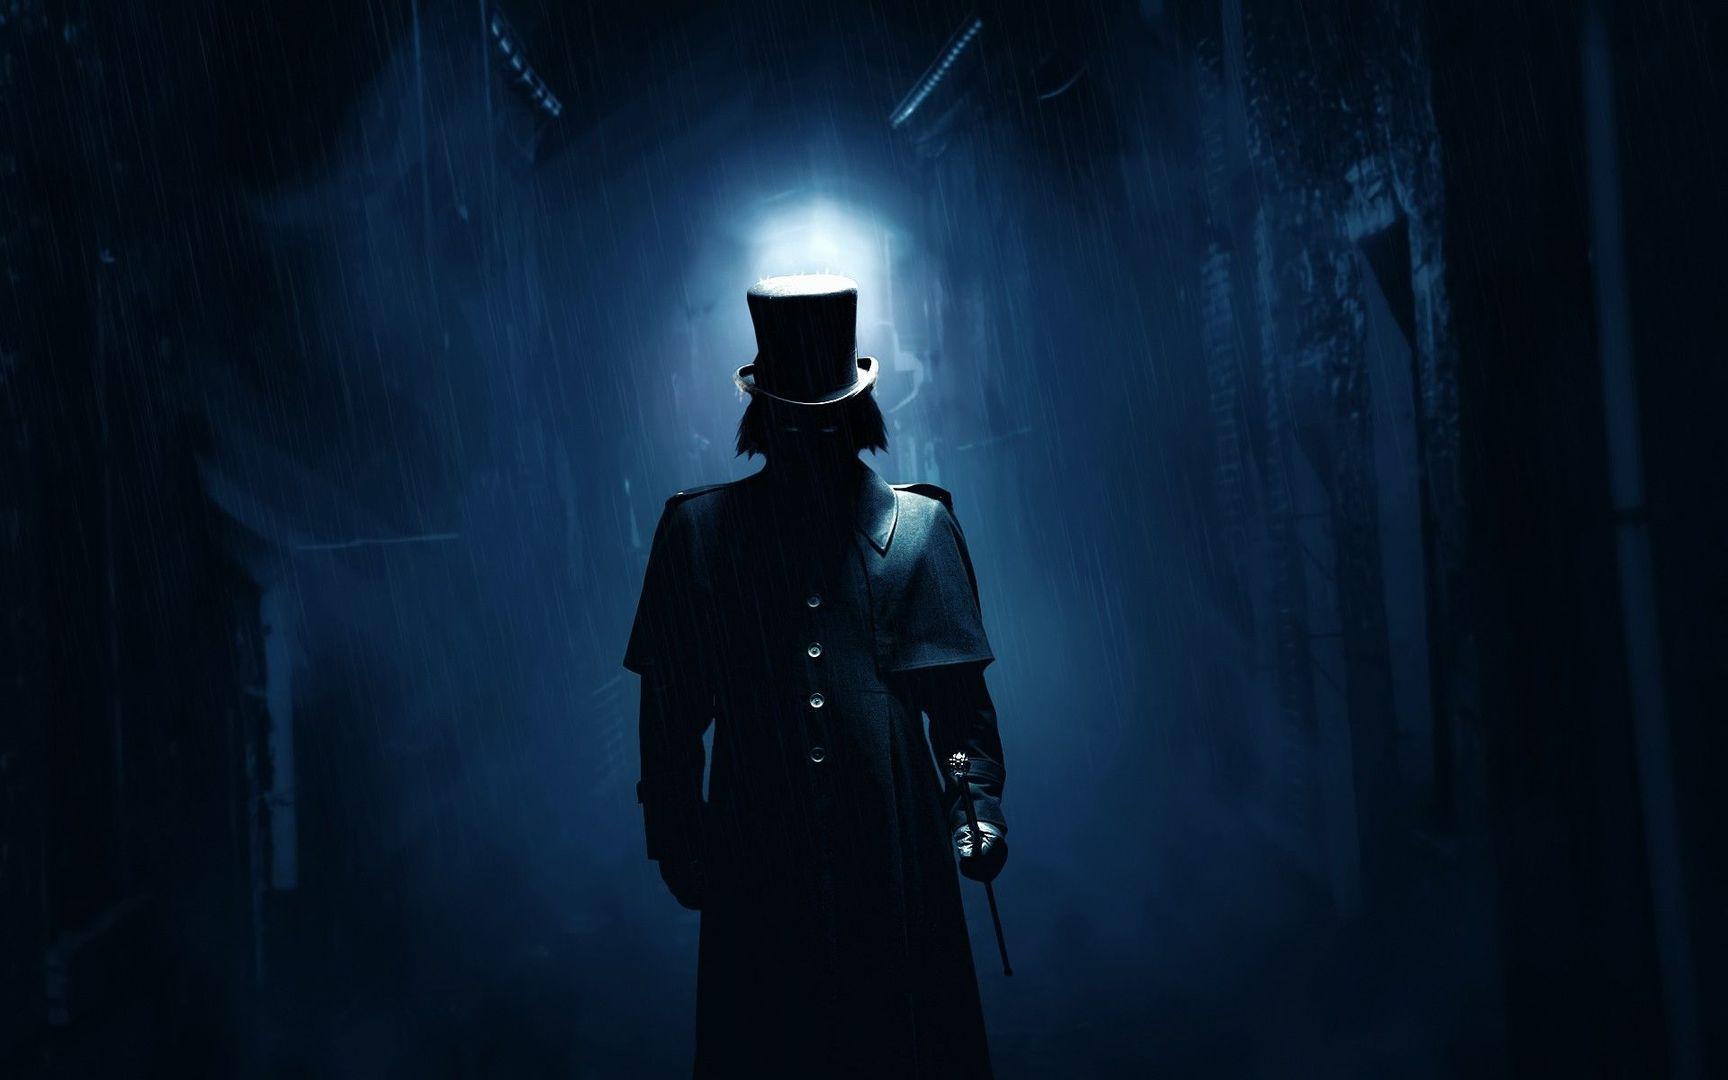 Download Abraham Lincoln   Vampire Hunter wallpaper 1728x1080